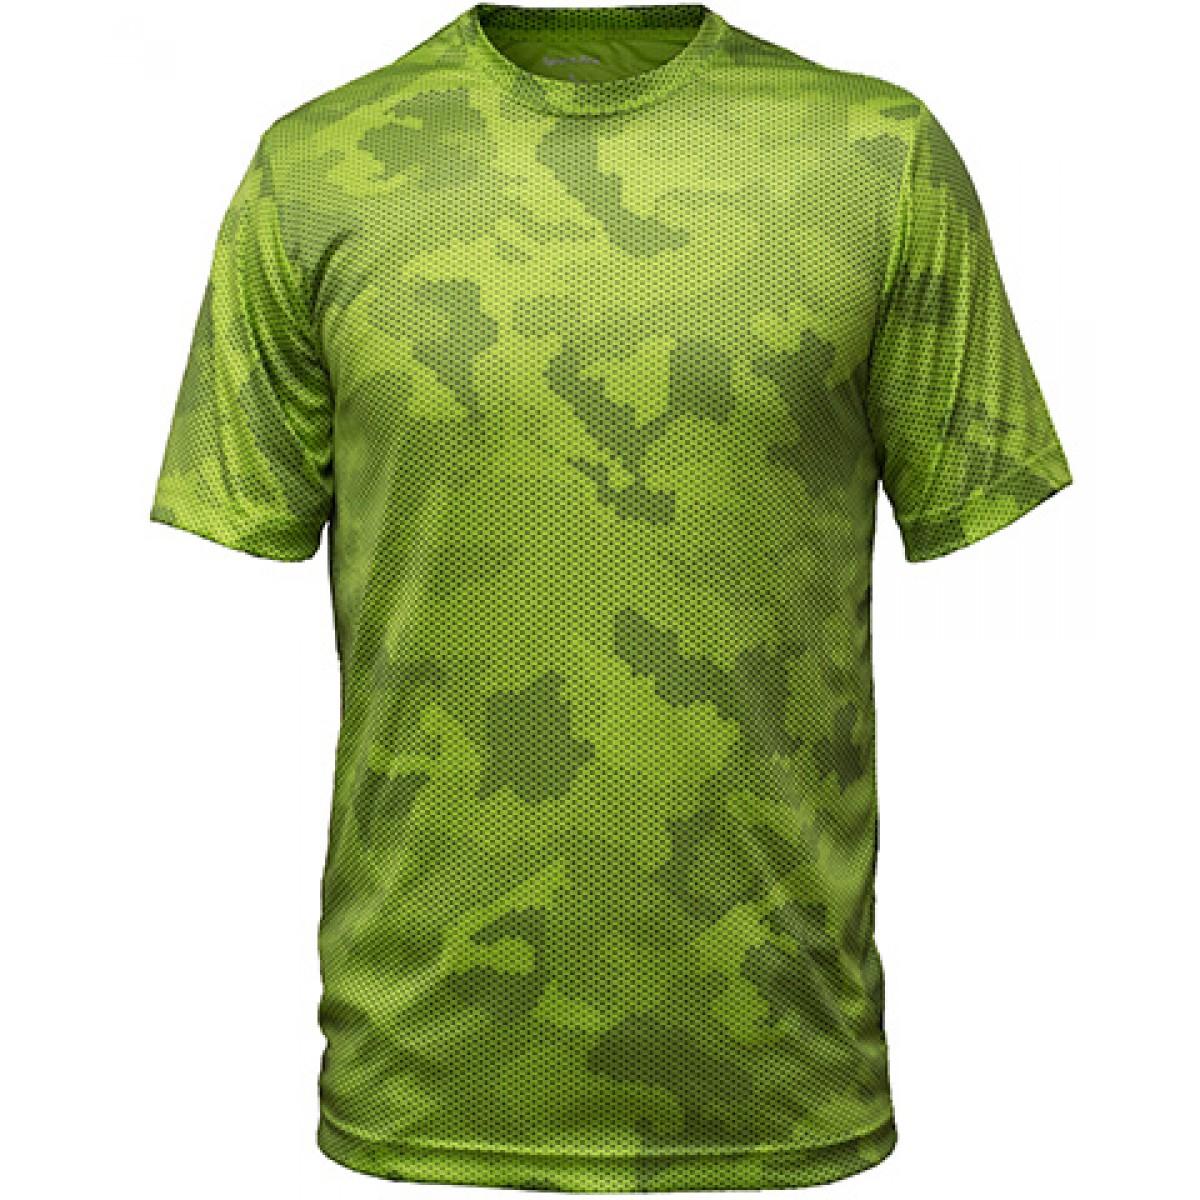 Sport-Tek CamoHex Tee-Green-2XL